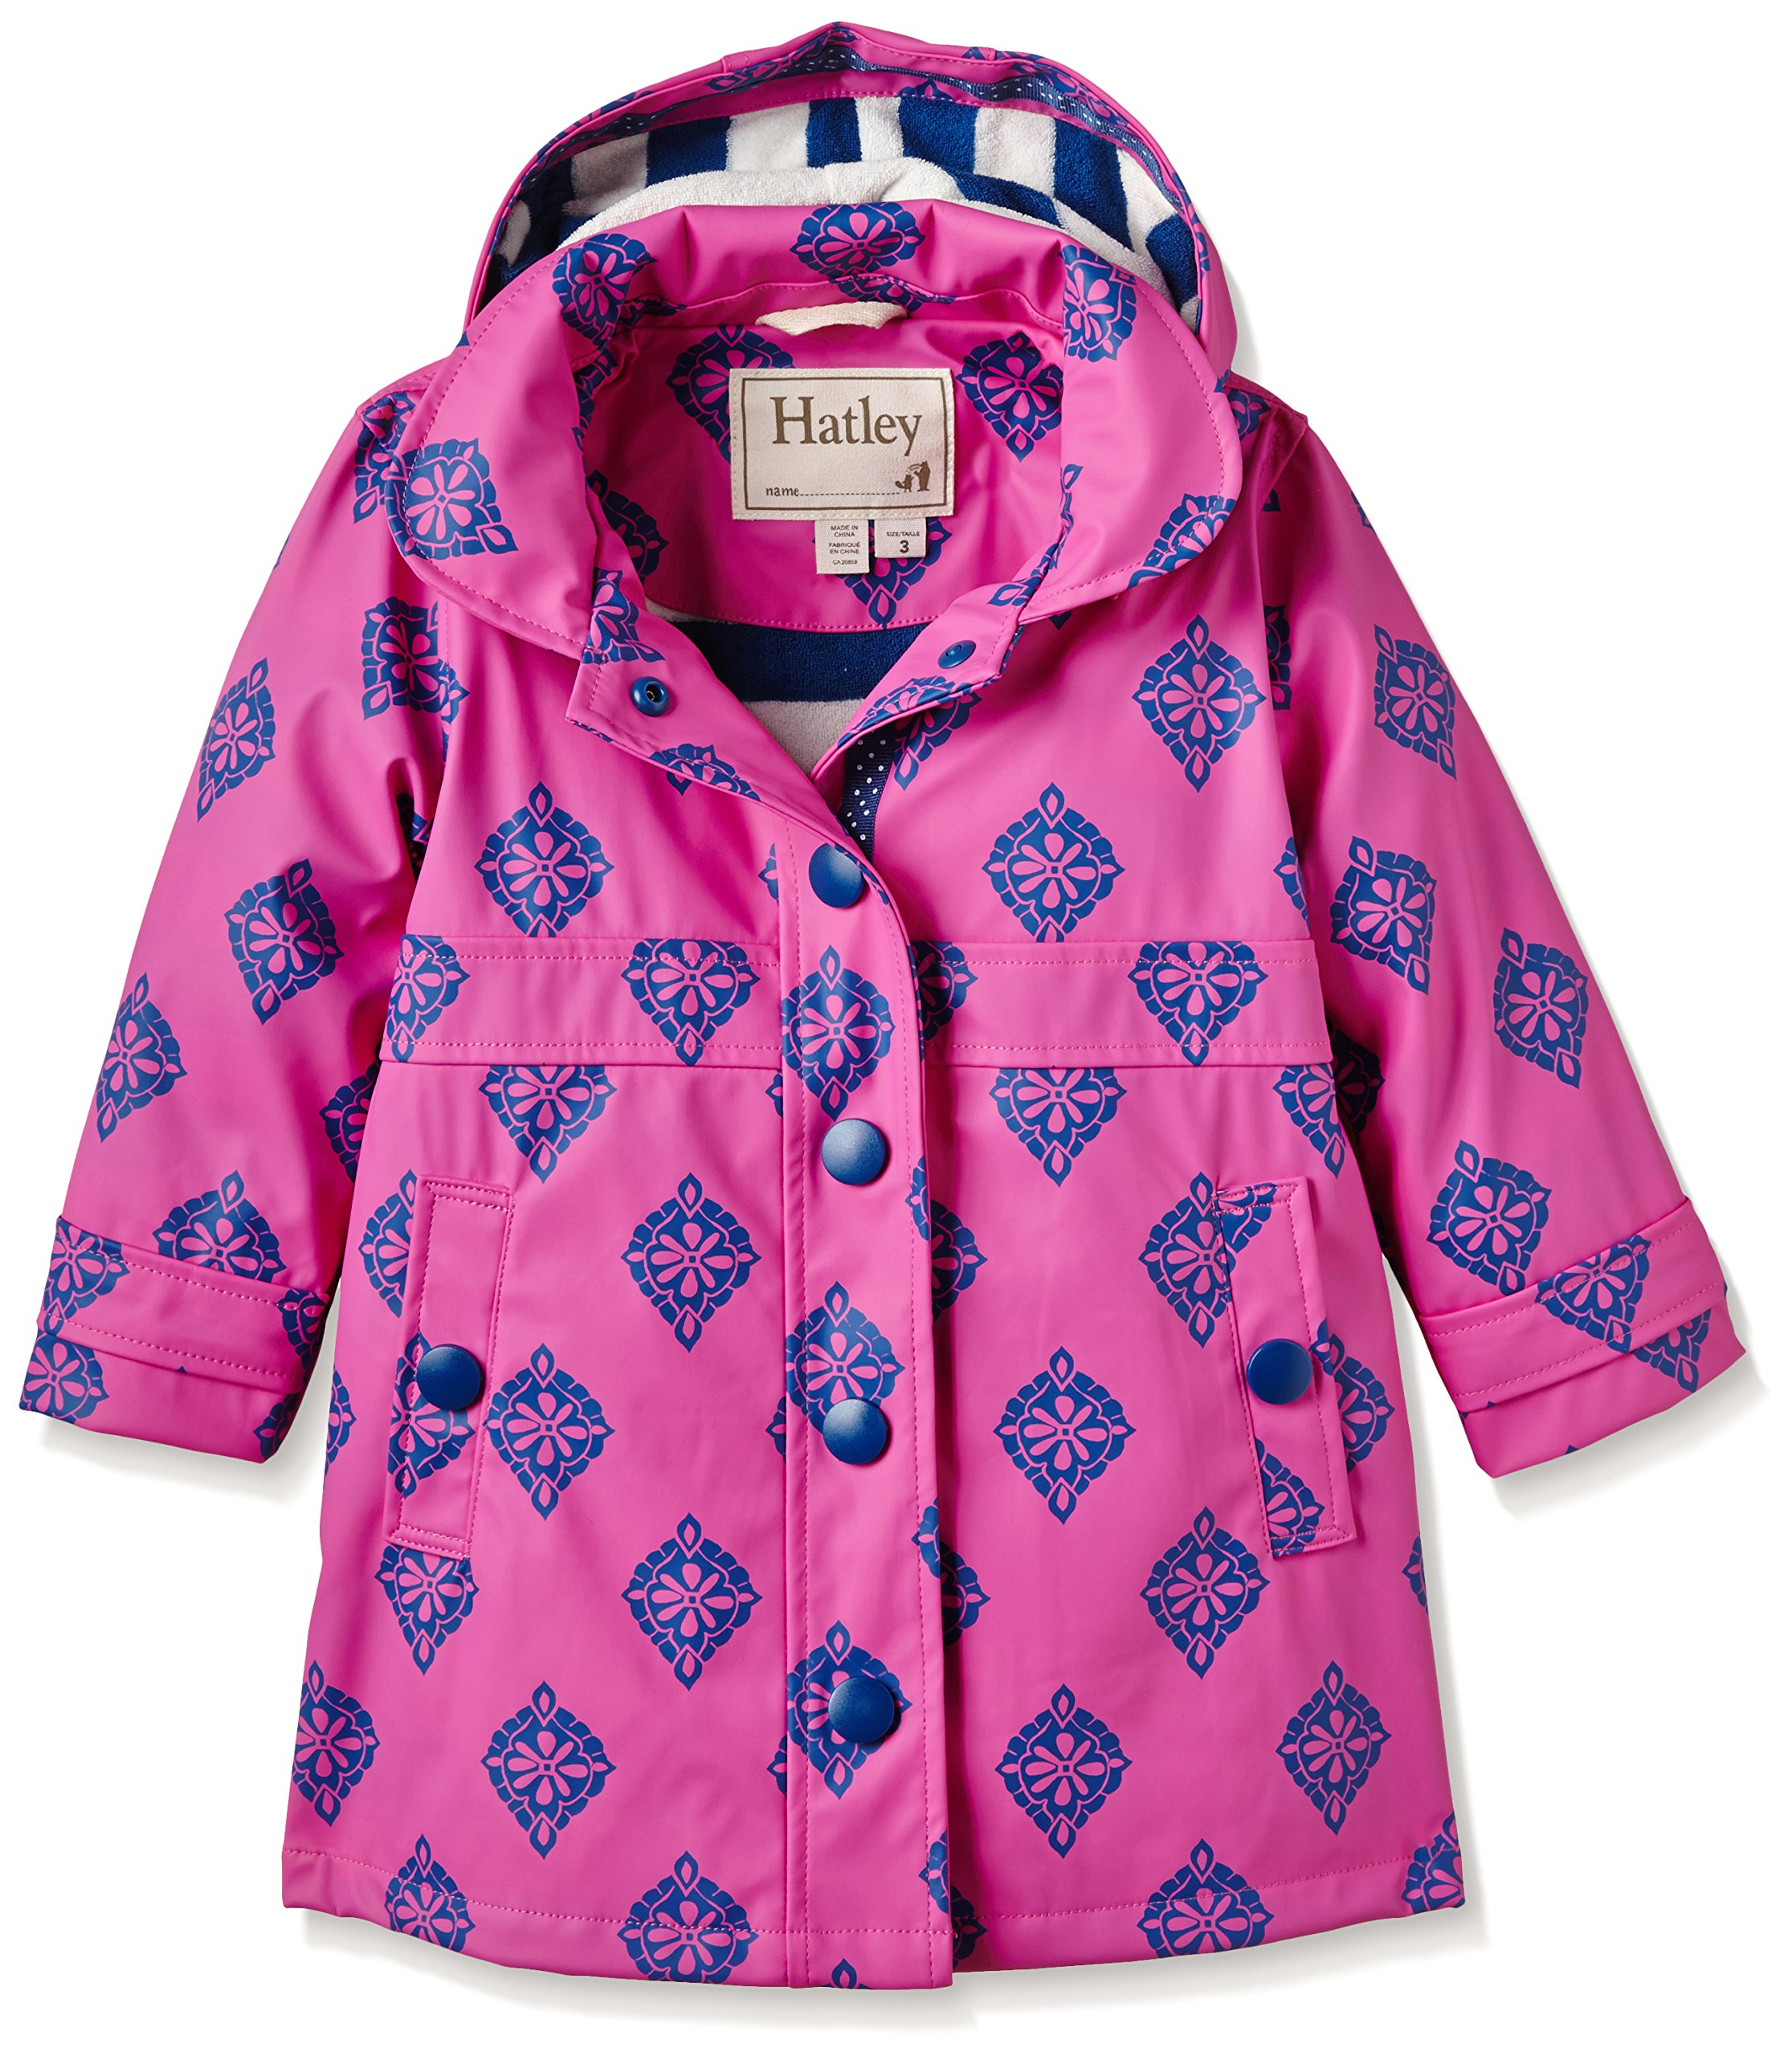 Hatley Little Girls' Splash Jacket Medallions, Pink, 4